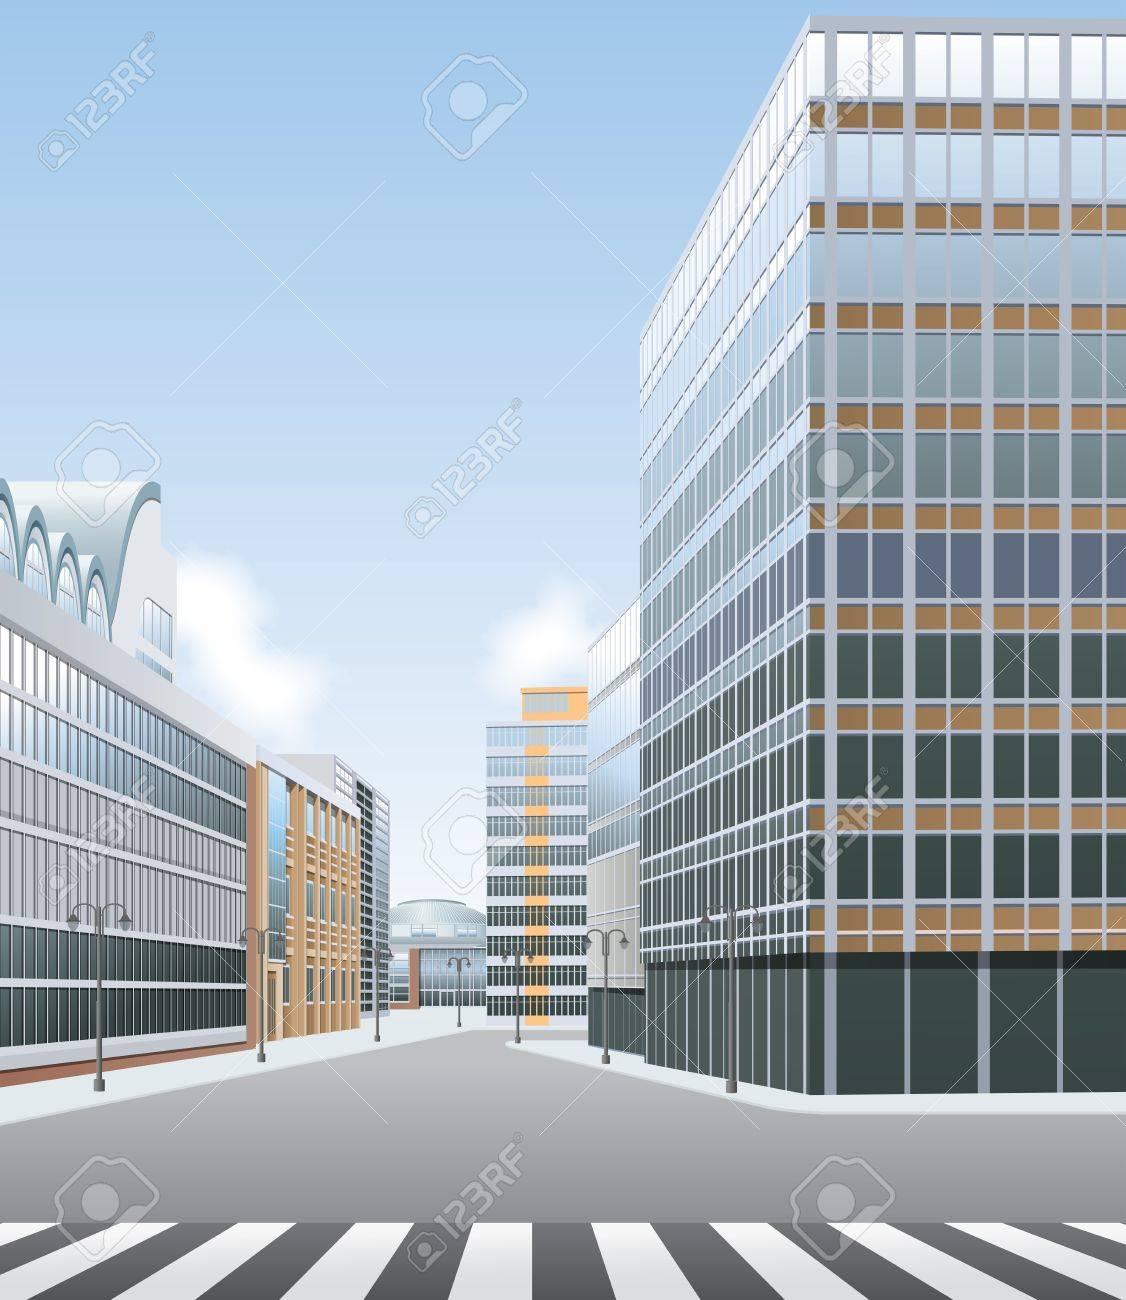 High street, business or shopping centre vector Stock Vector - 16002102